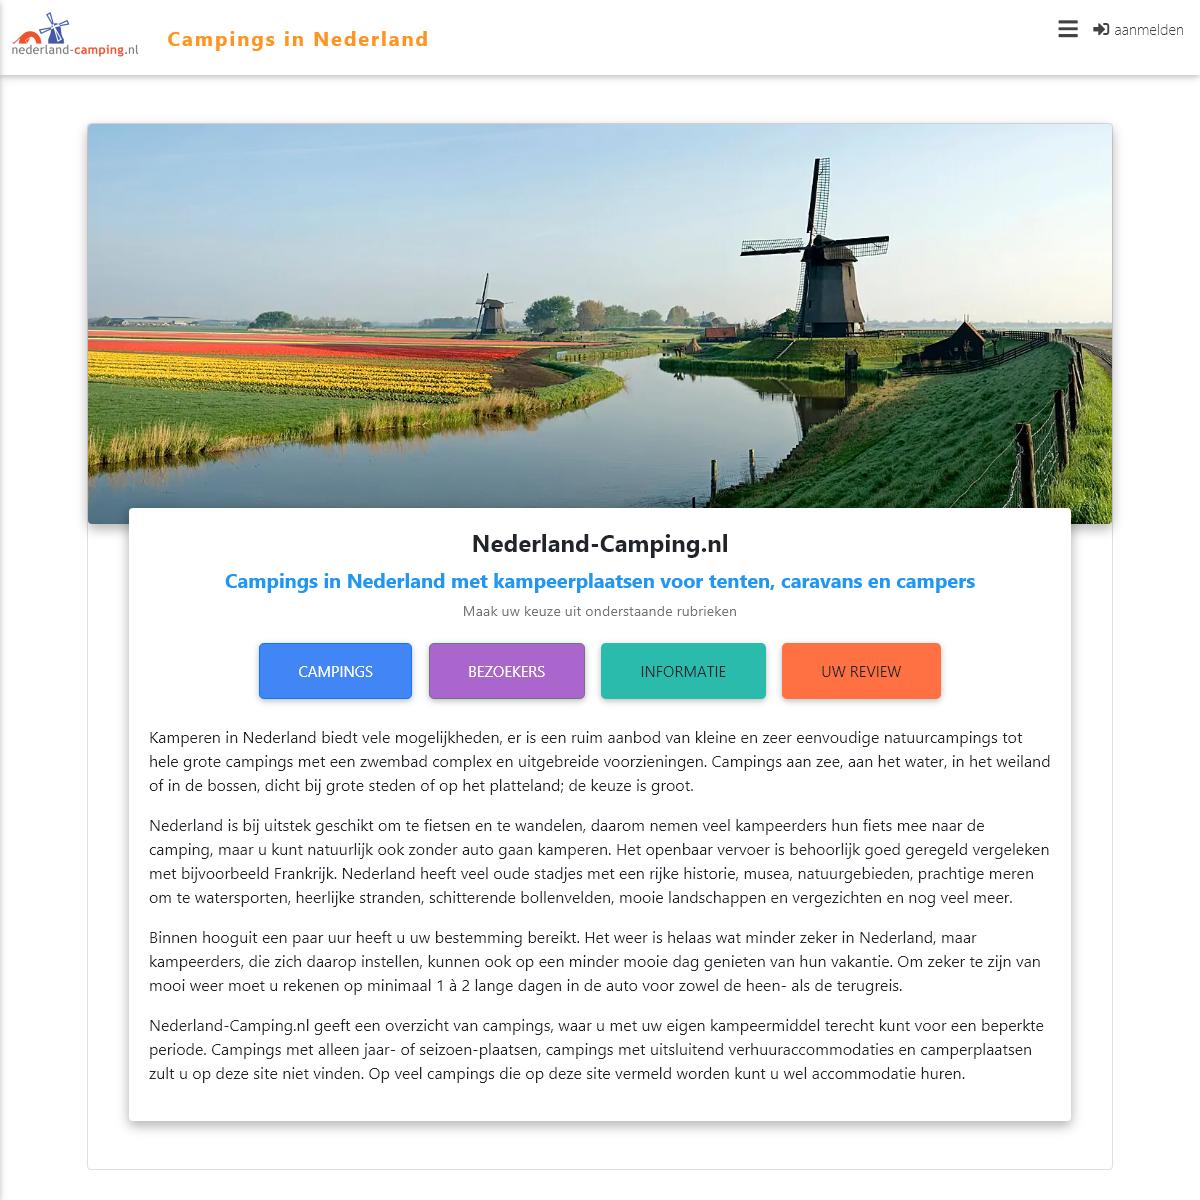 Campings in Nederland - Nederland-Camping.nl